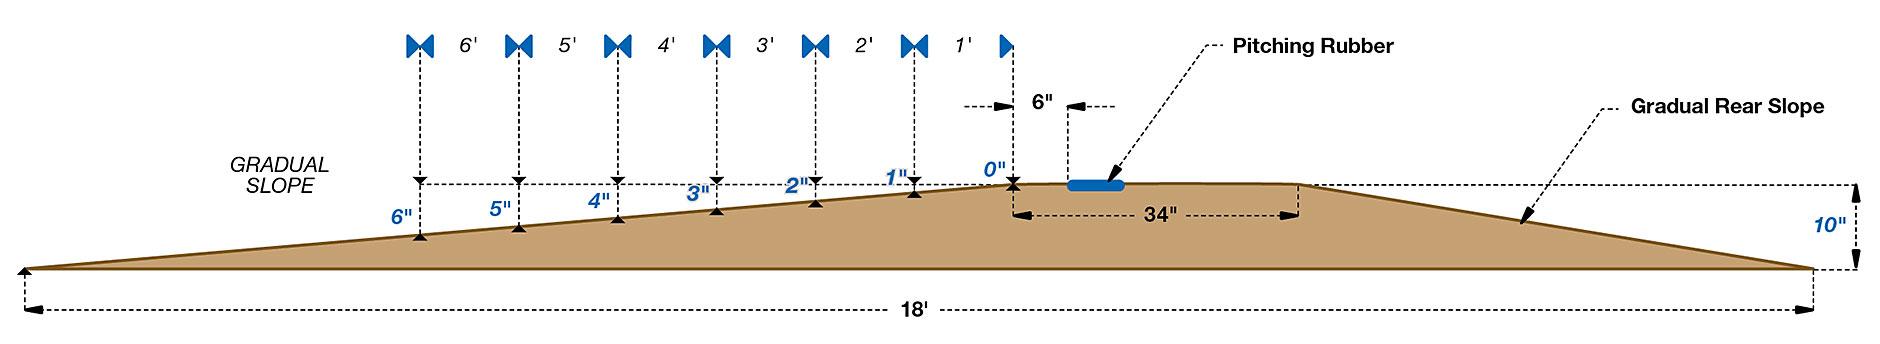 10-inch Mound | Beacon Athletics